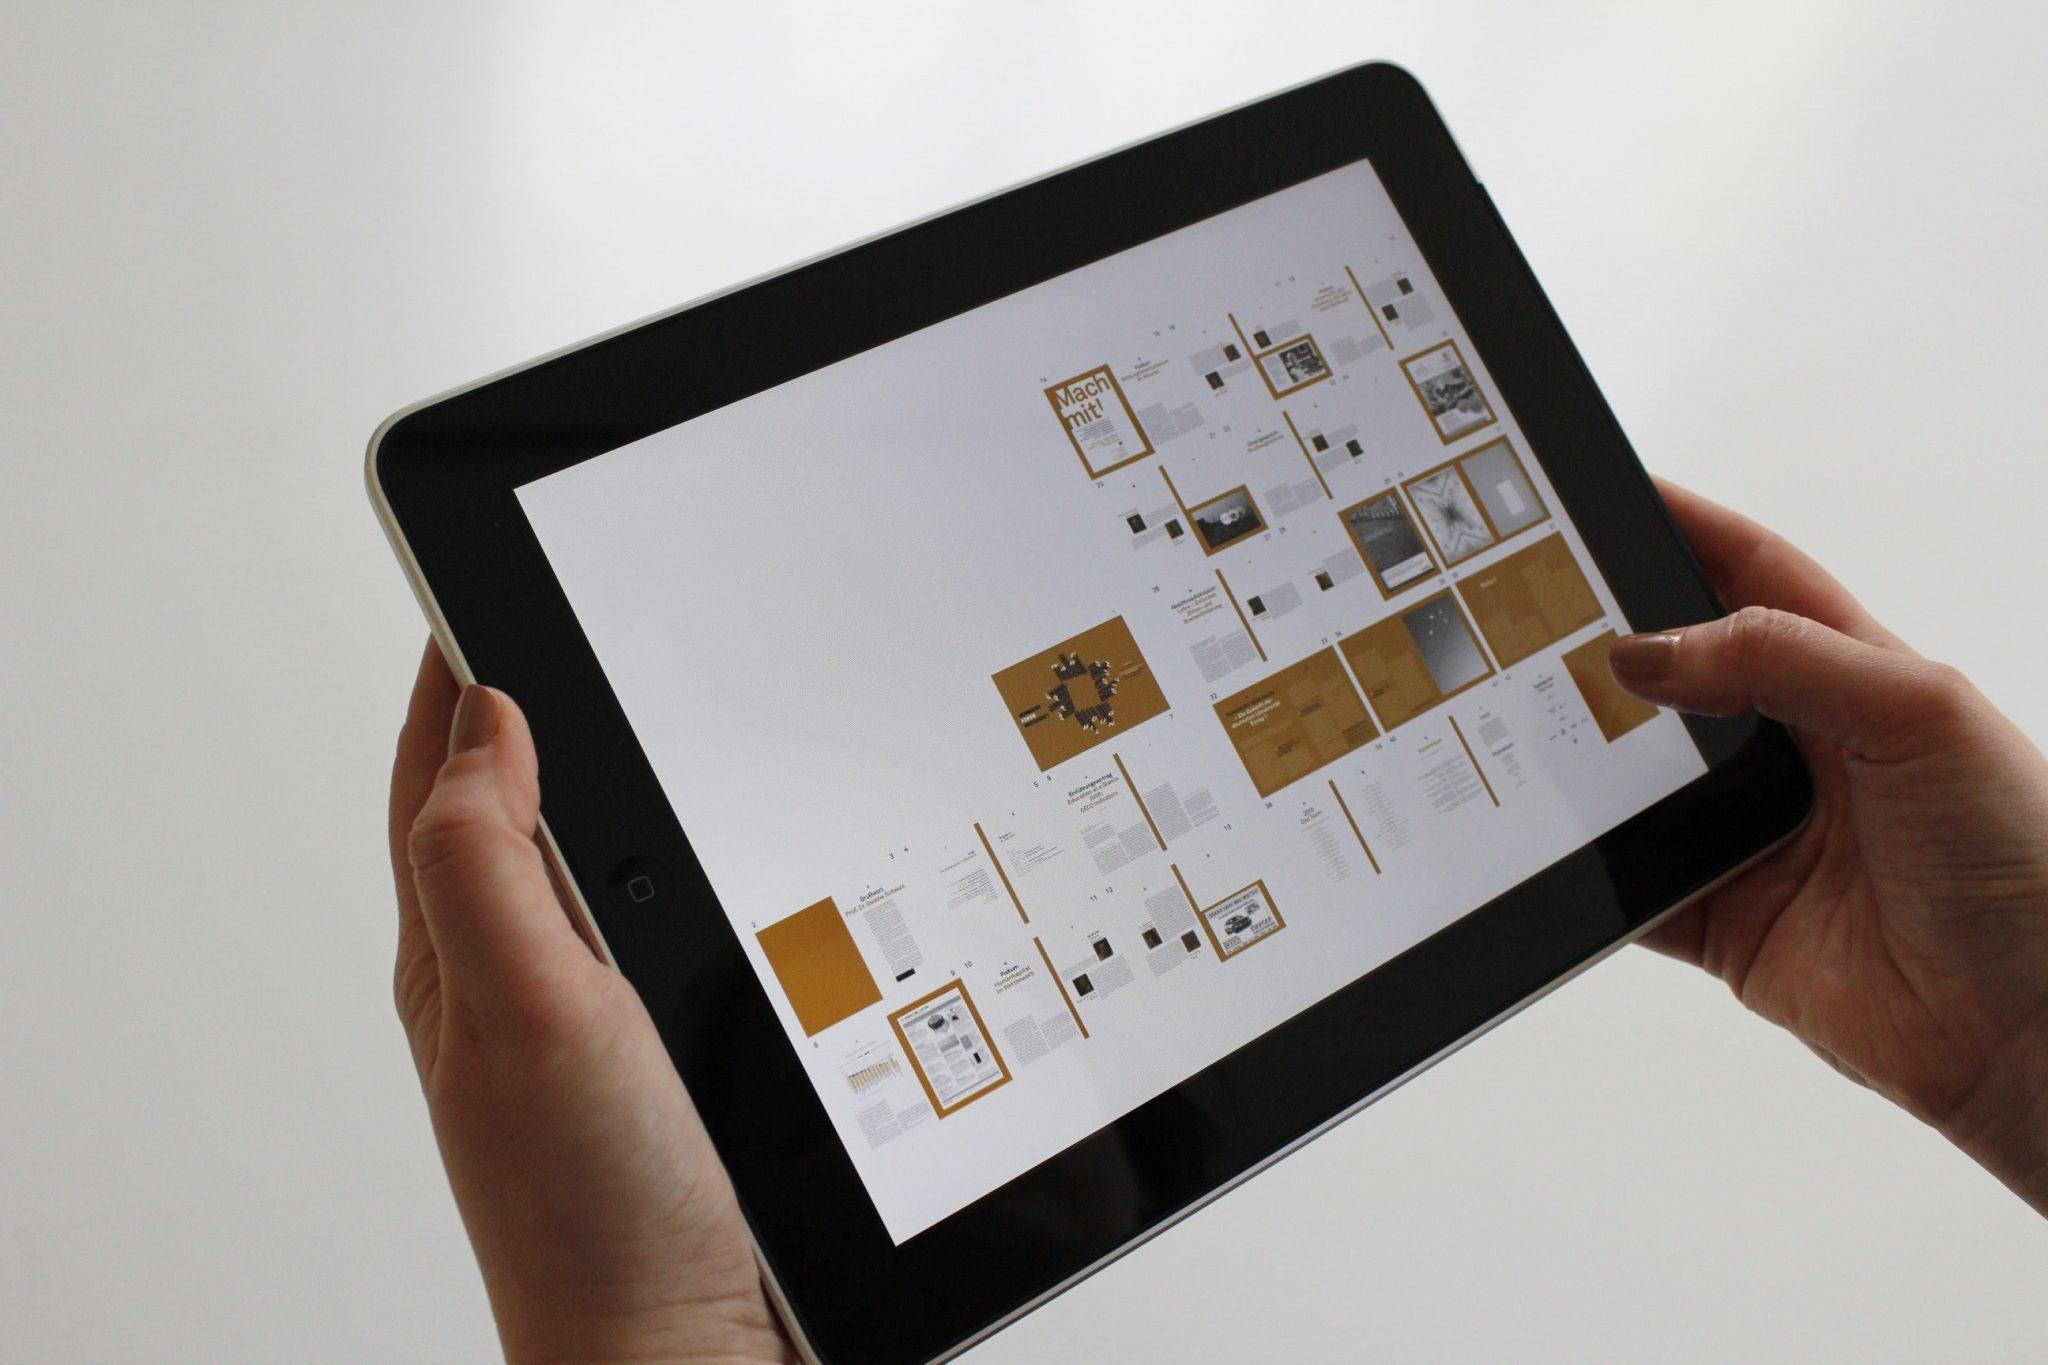 iPad and Tablet Repairs